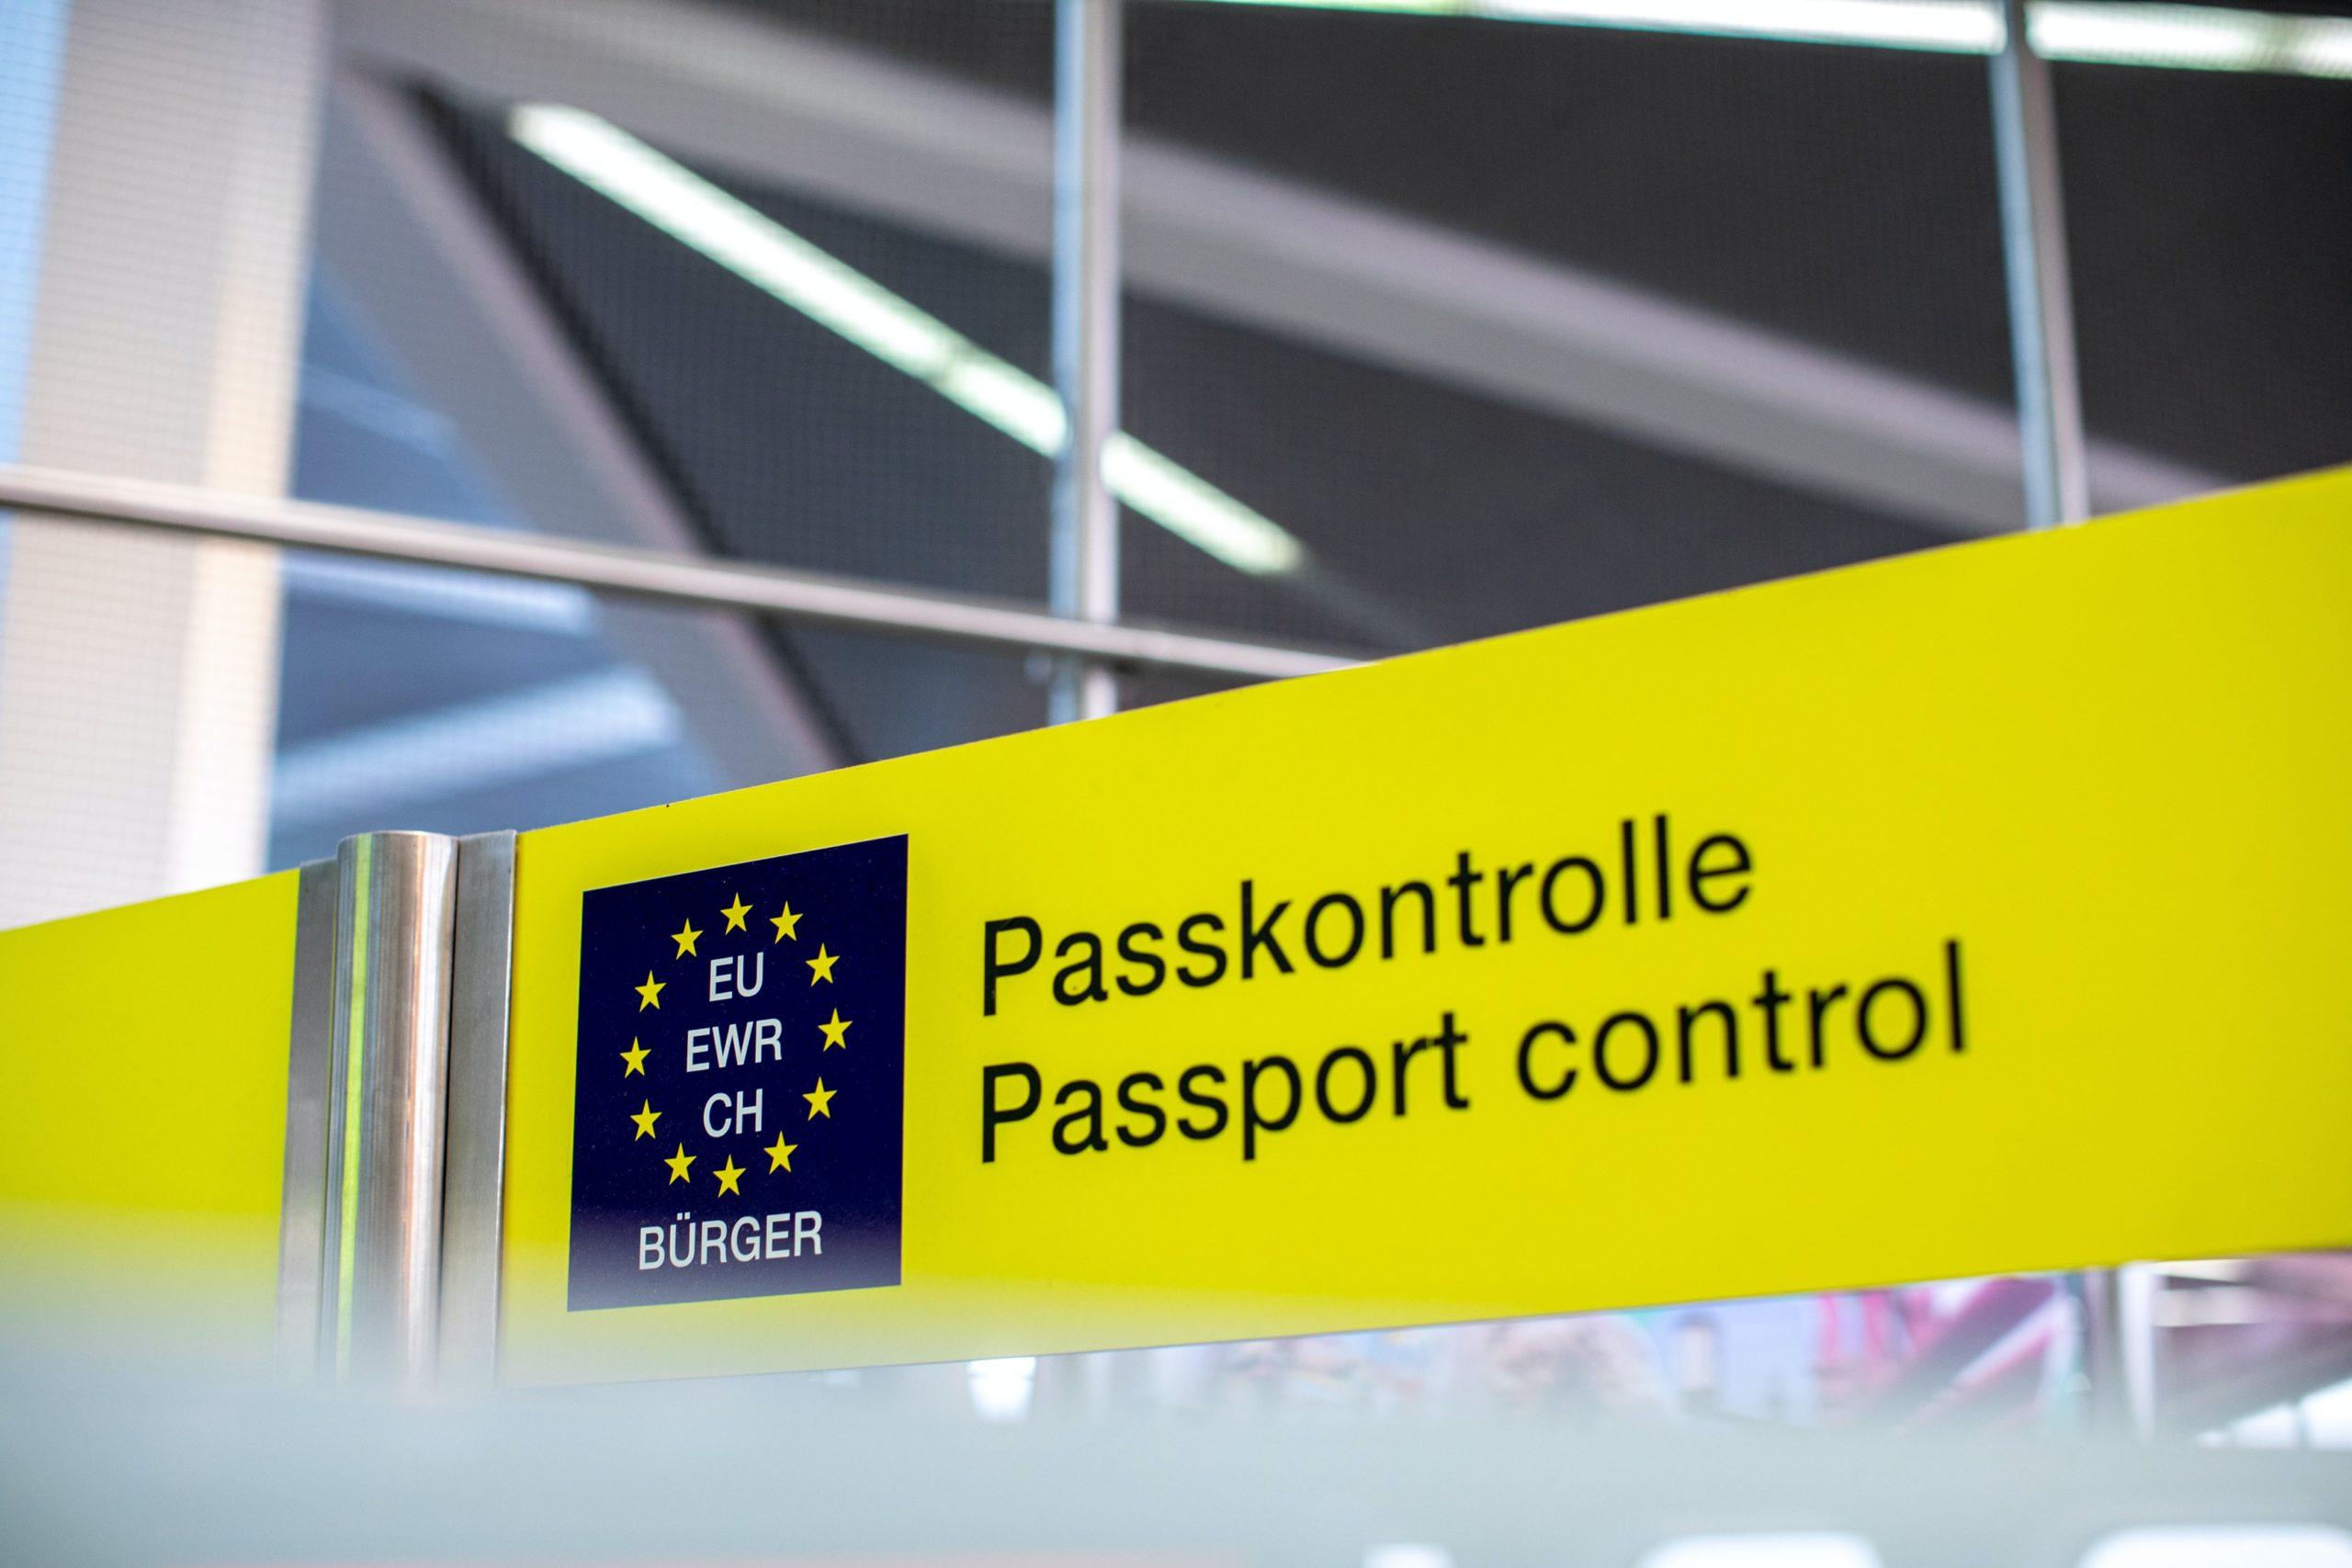 Airport sign reading Passport Control. Photo by Daniel Schludi on Unsplash